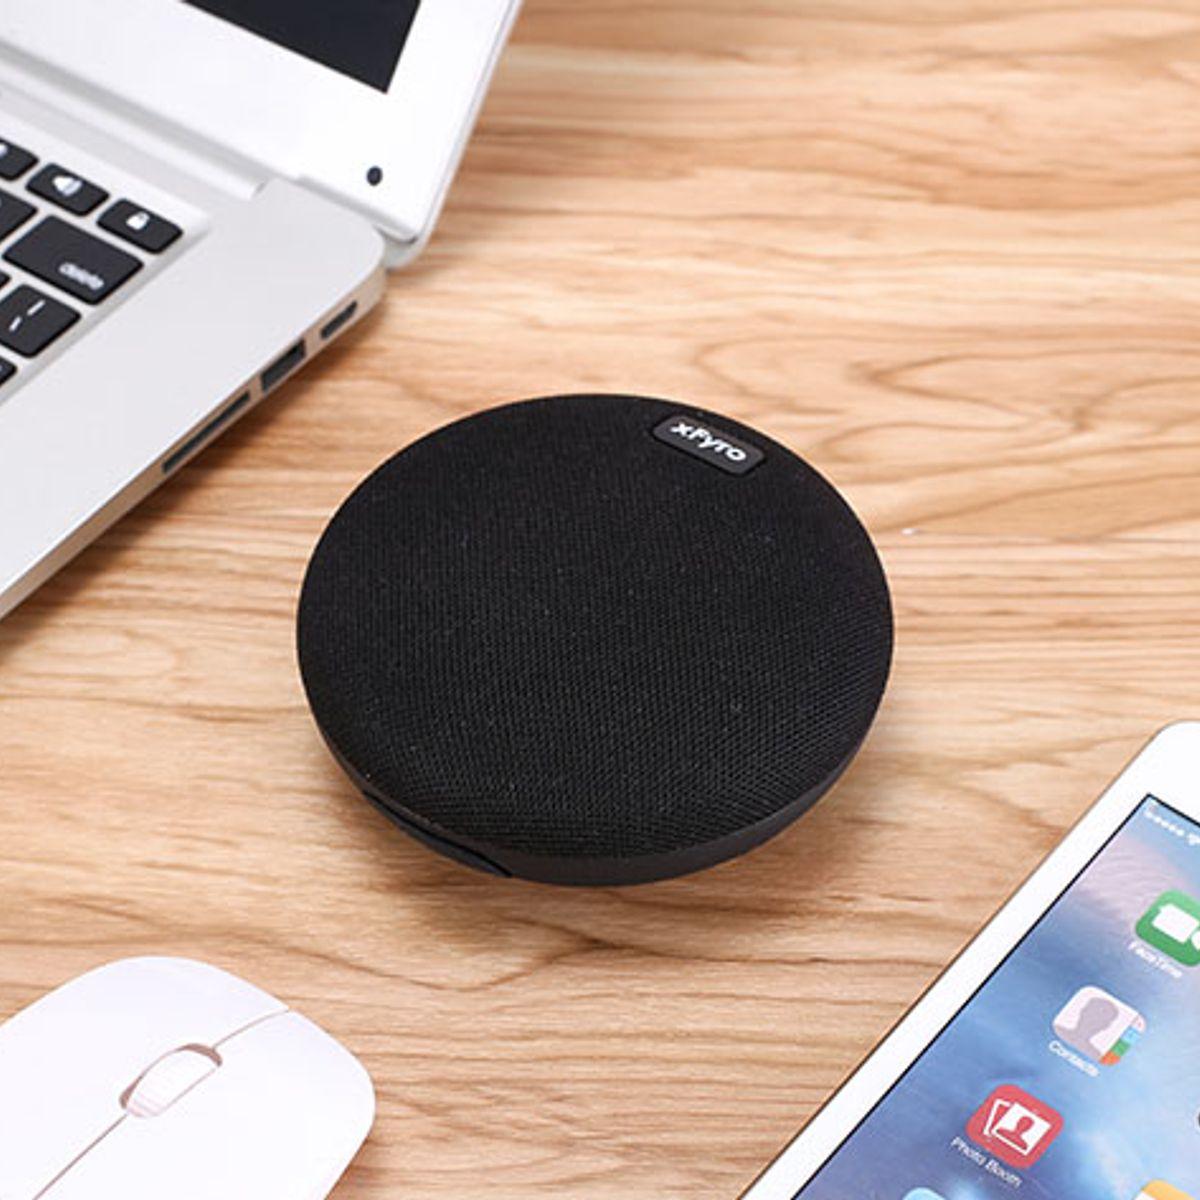 This waterproof Bluetooth speaker is 30% off today